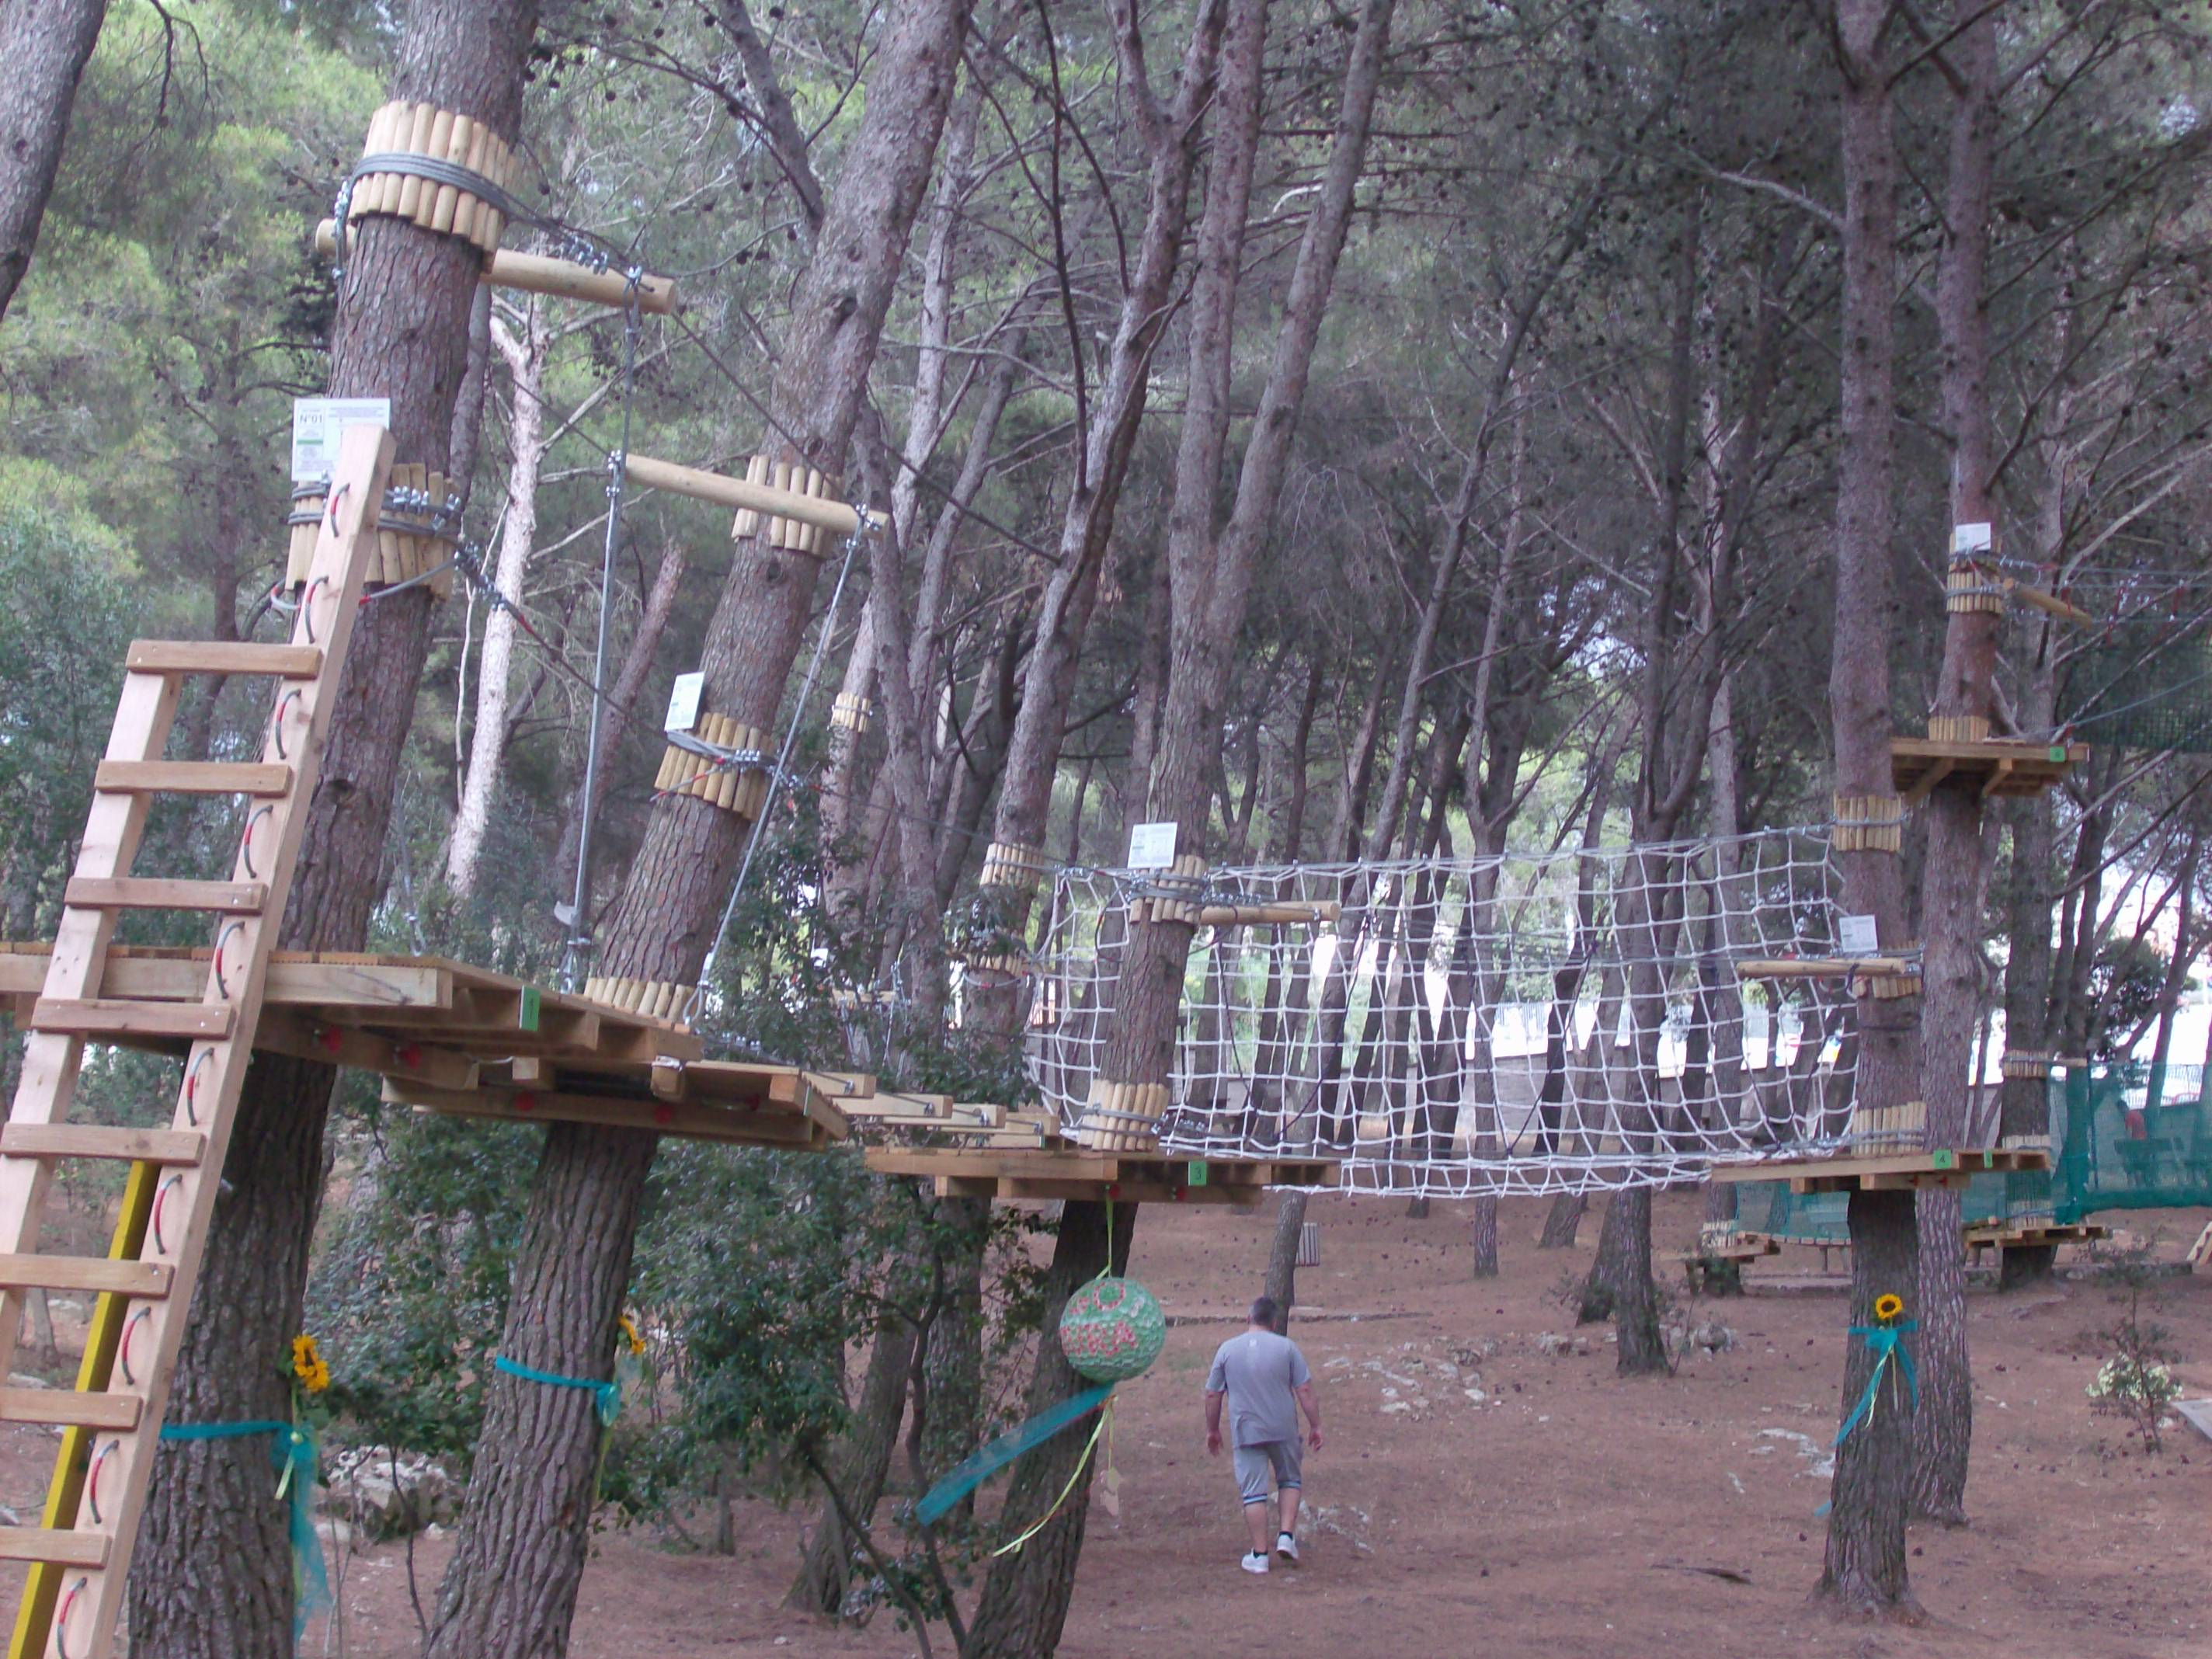 Struttura parco Baddimanna